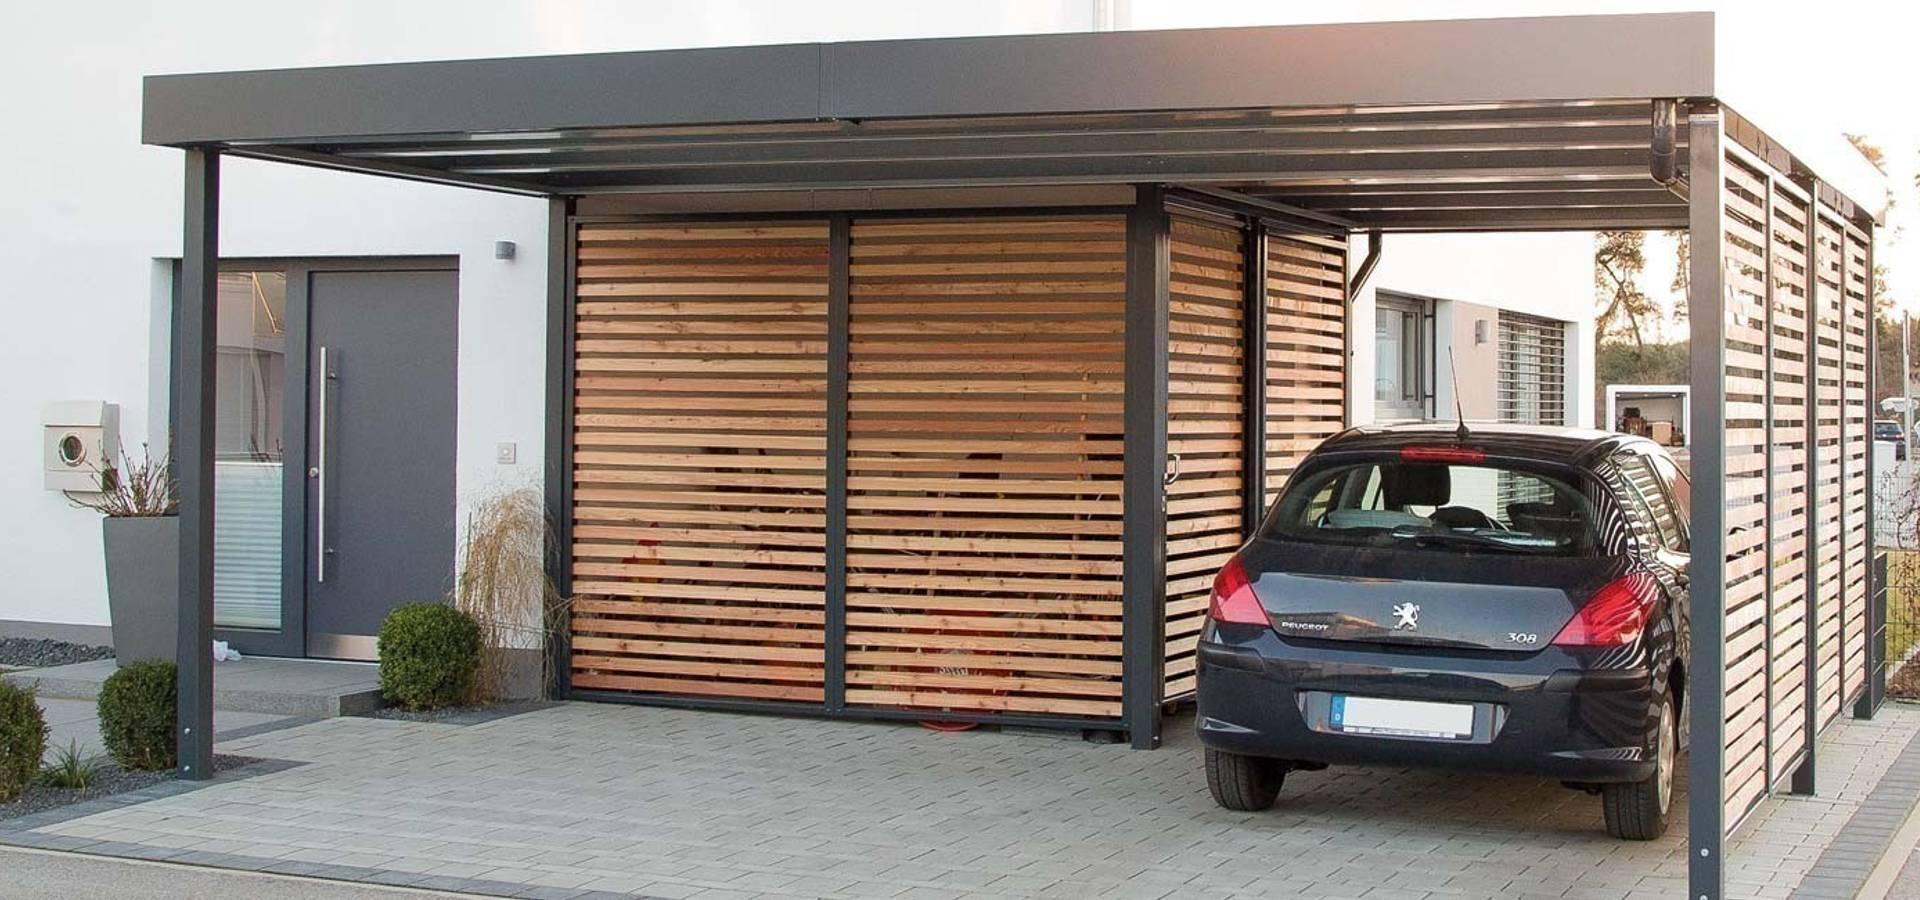 Eingangsüberdachung carports aus stahl siebau by siebau raumsysteme gmbh co kg